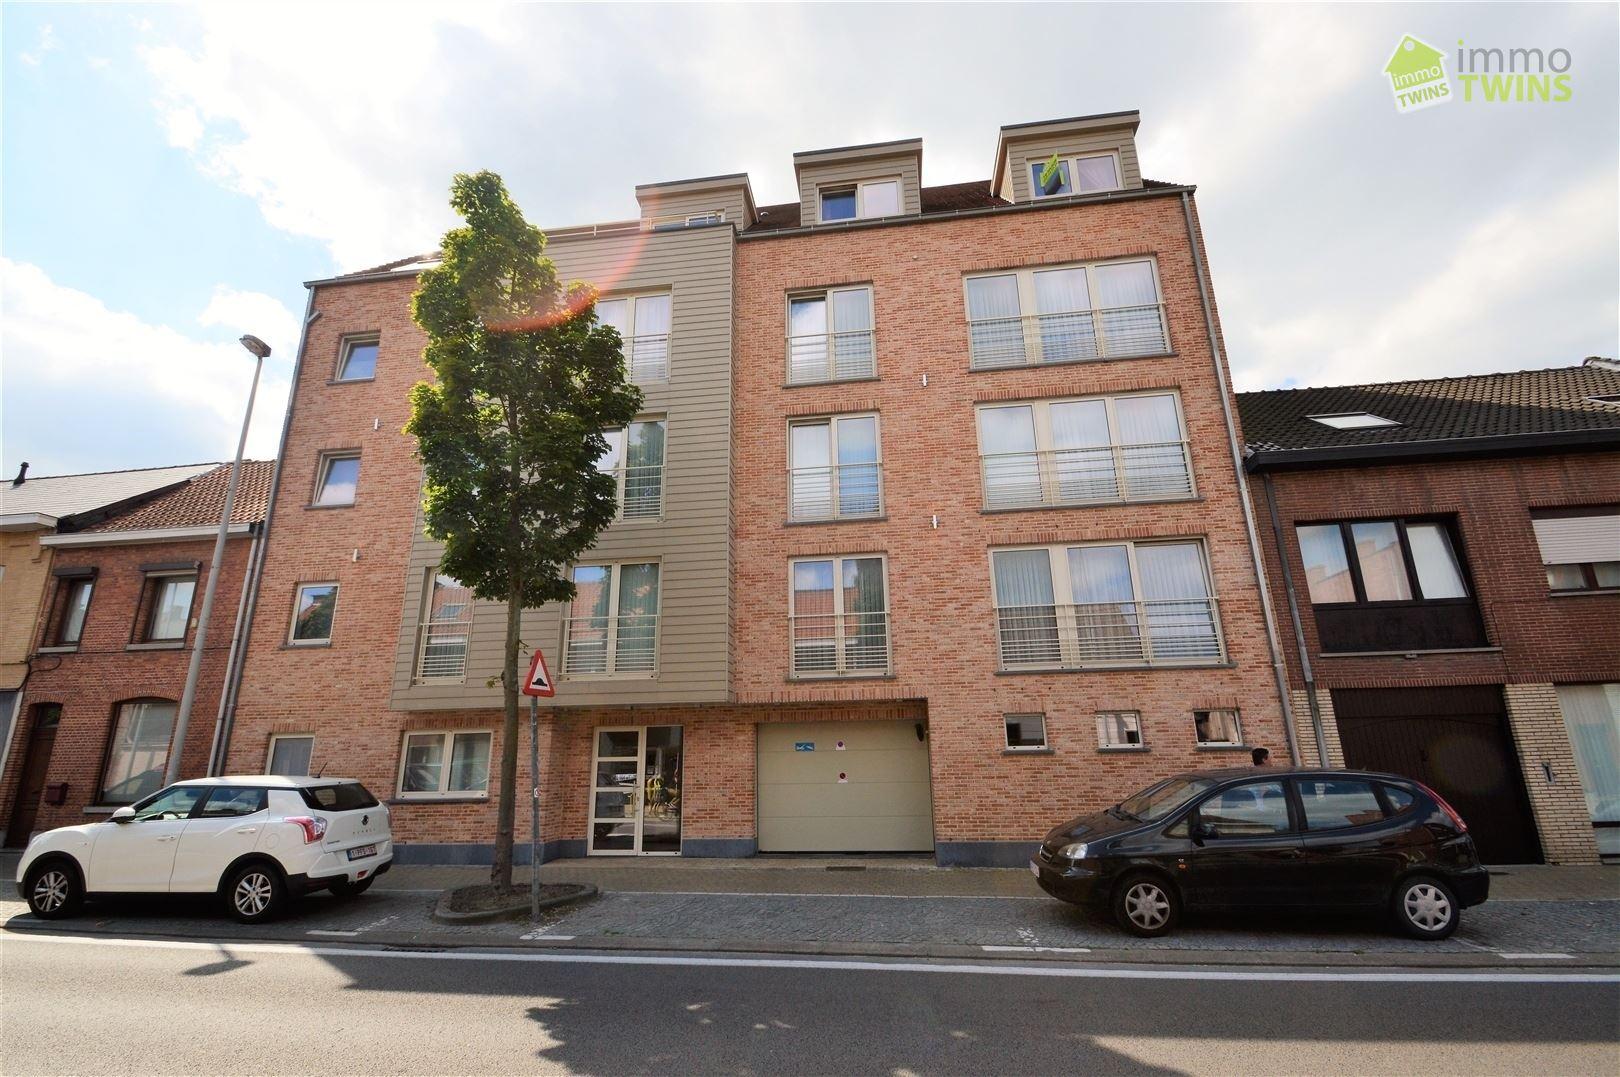 Foto 1 : Appartement te 9200 SINT-GILLIS-DENDERMONDE (België) - Prijs € 835